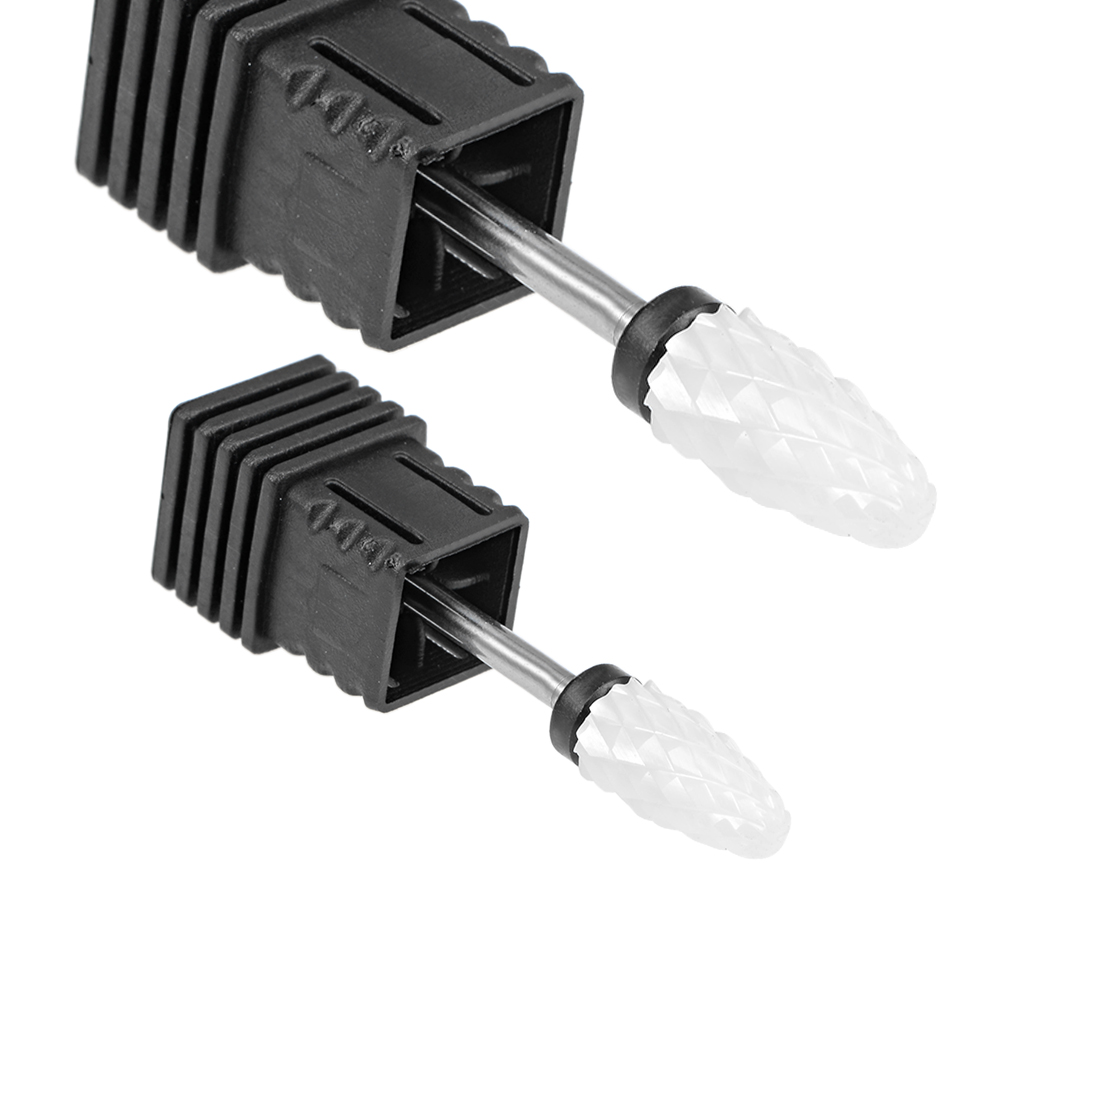 2pcs Ceramic Nail Drill Bits 3/32 inch (Extra Coarse Grit) Nails File Bit Black